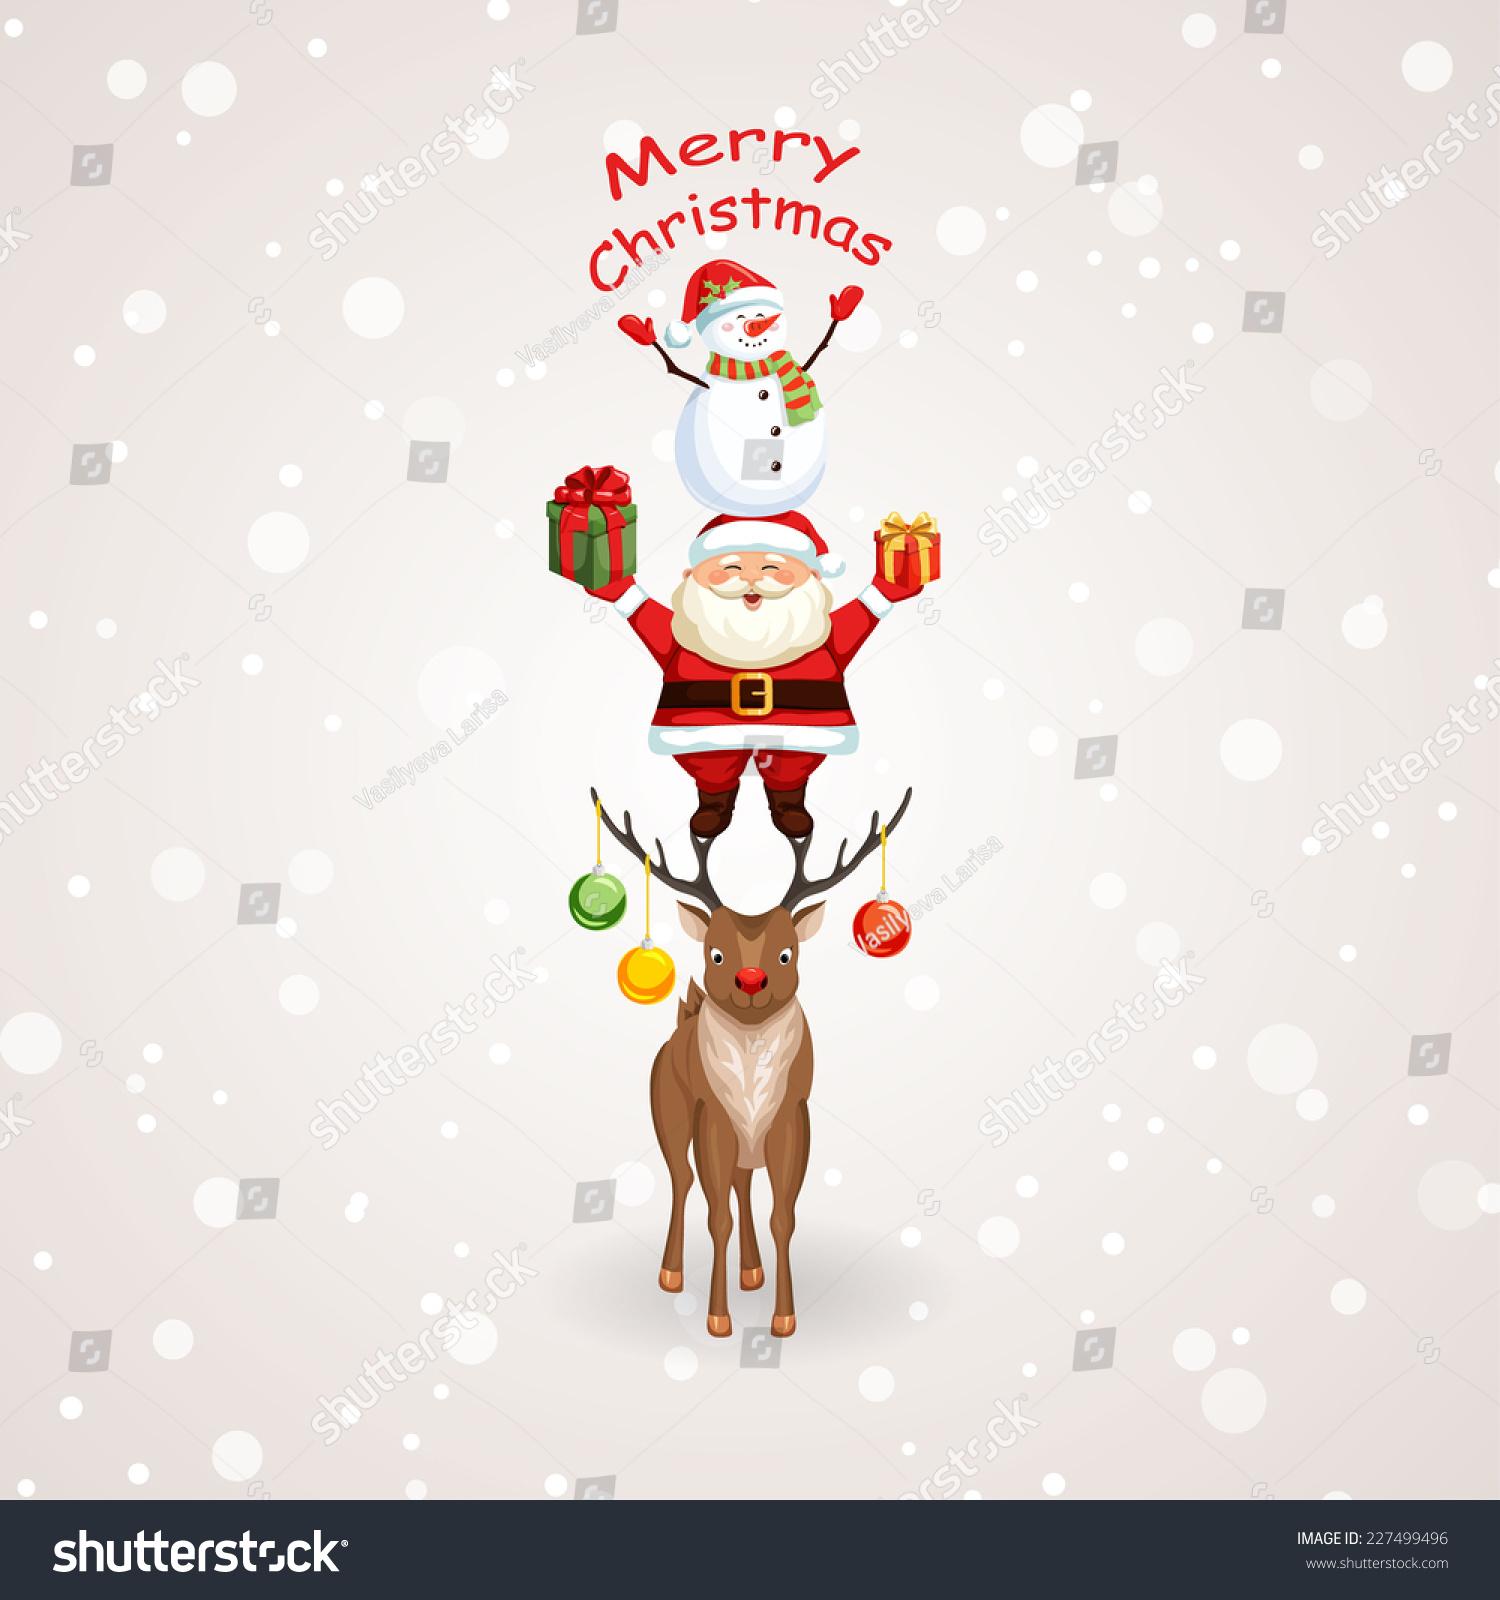 Christmas Tree Santa Claus Reindeer Snowman Stock Vector ...